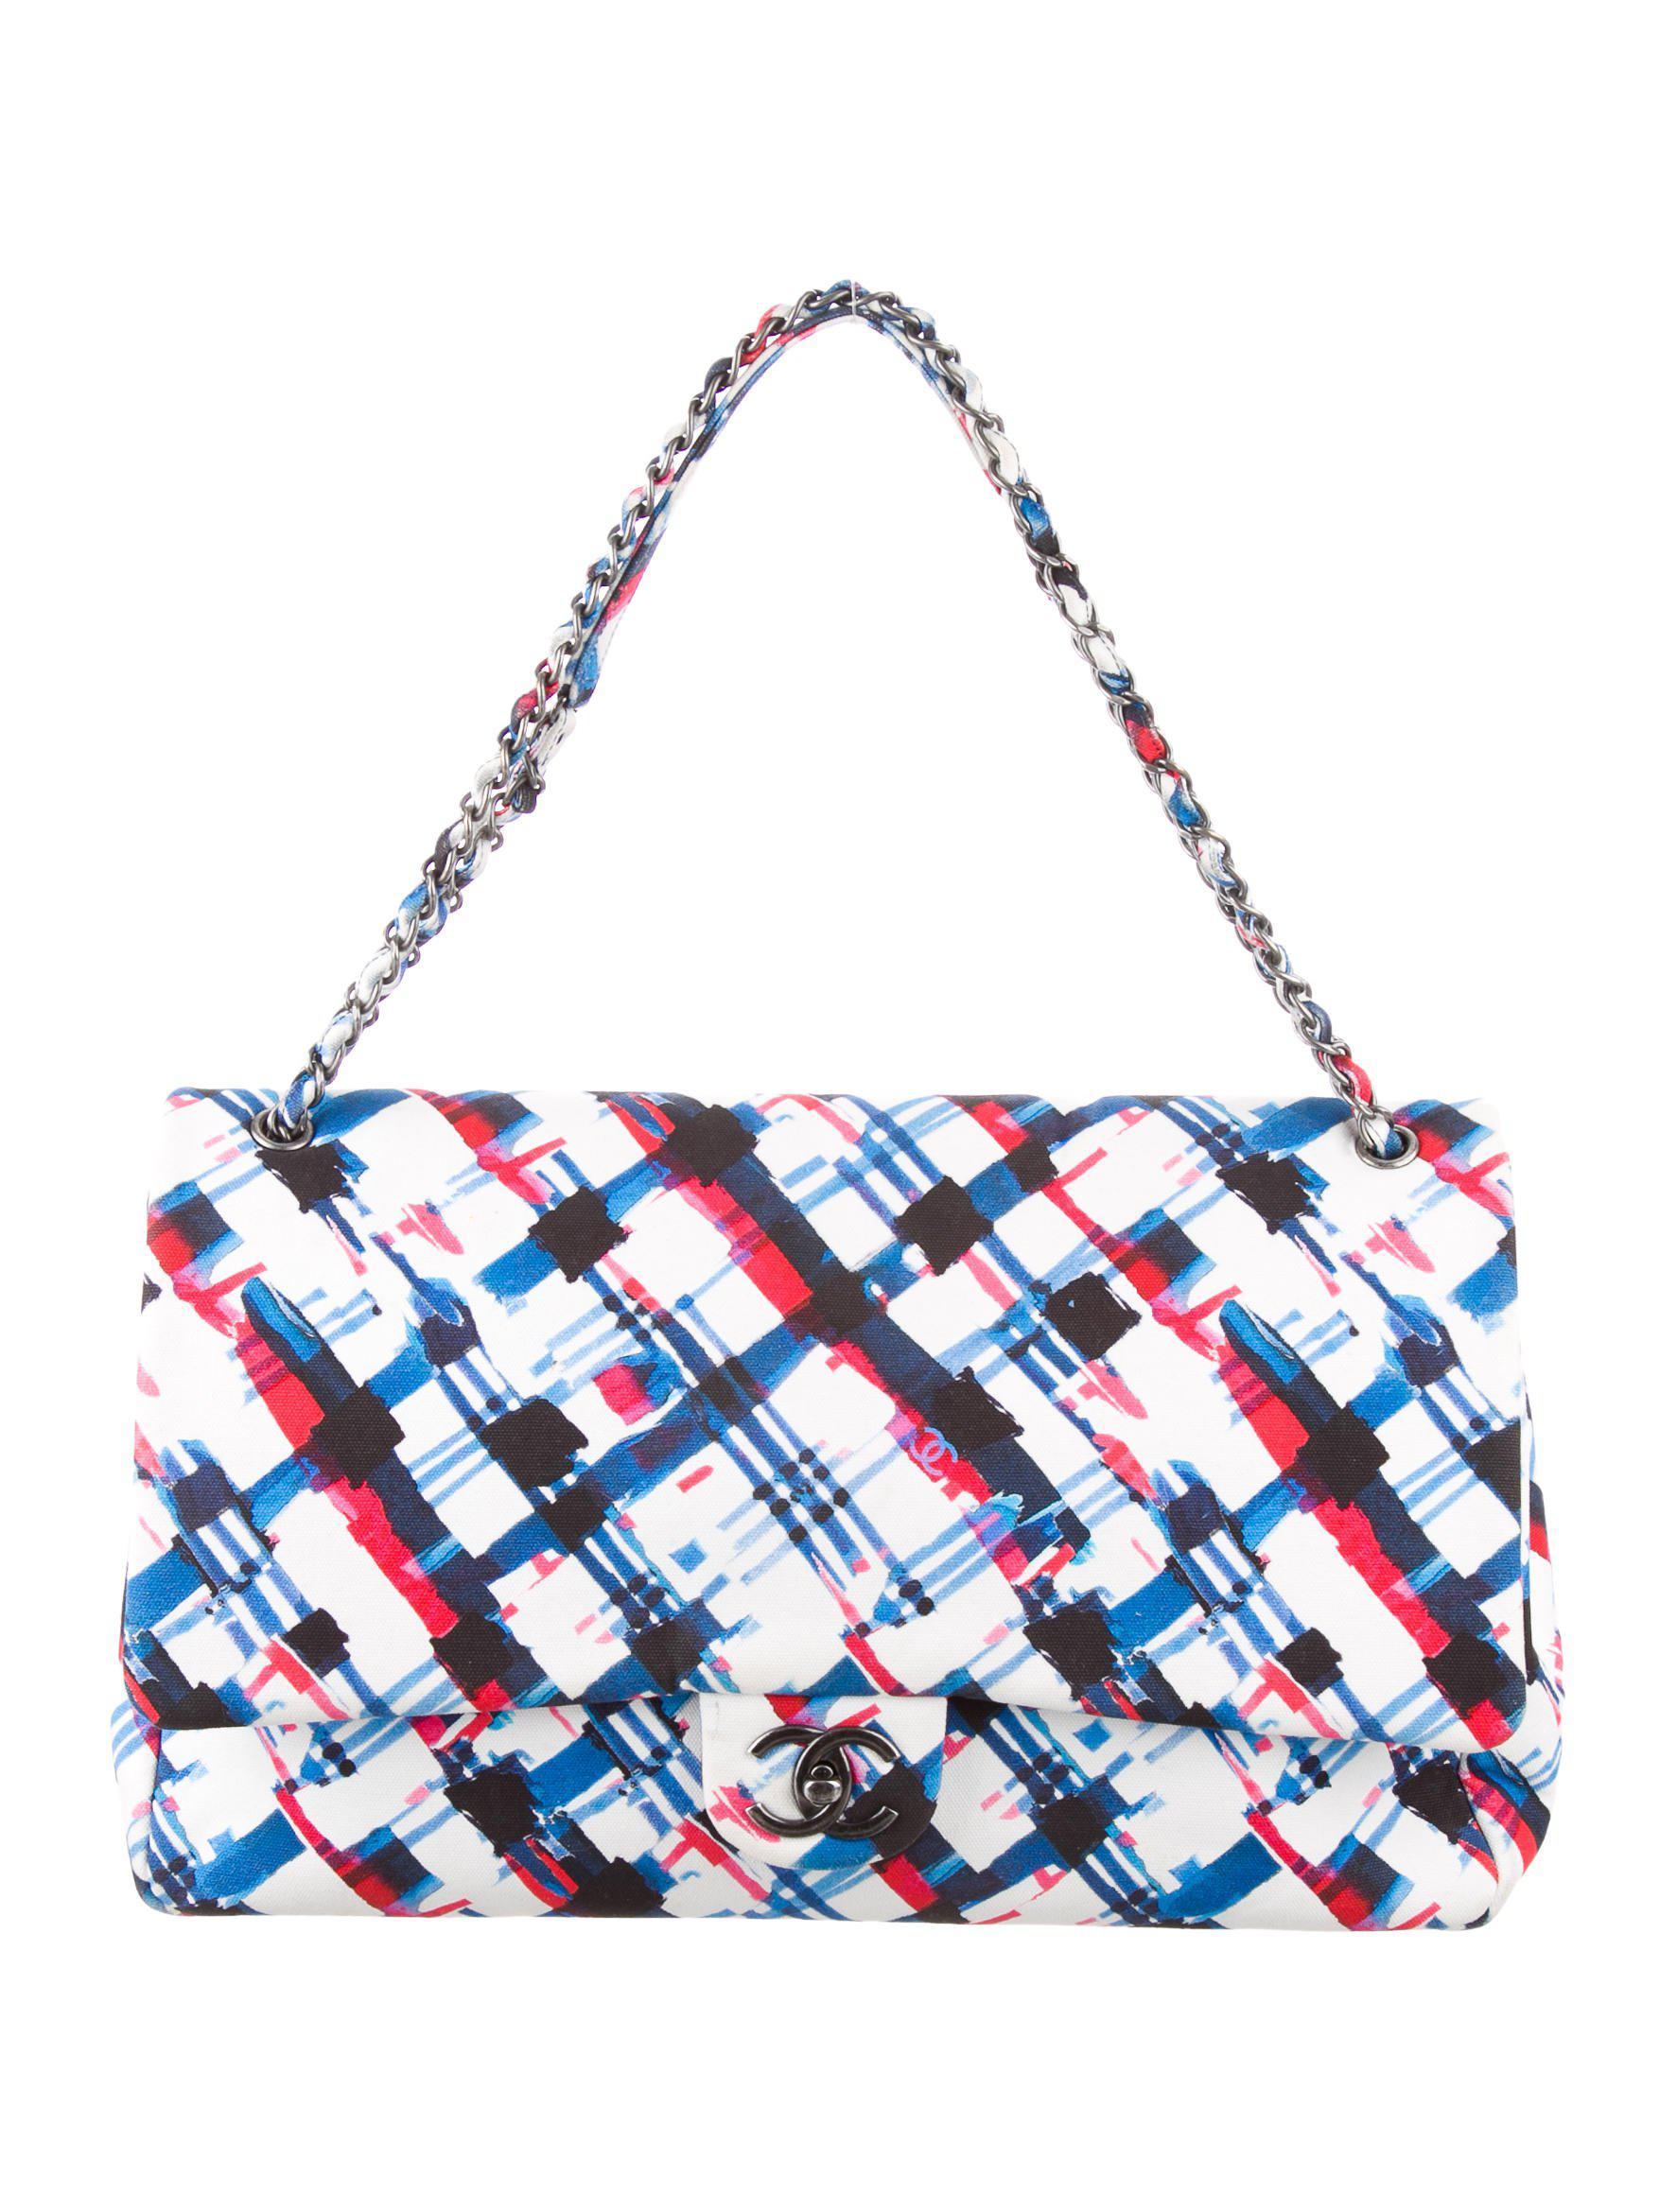 b28fbb5fe64a Chanel Jumbo Xxl Travel Bag